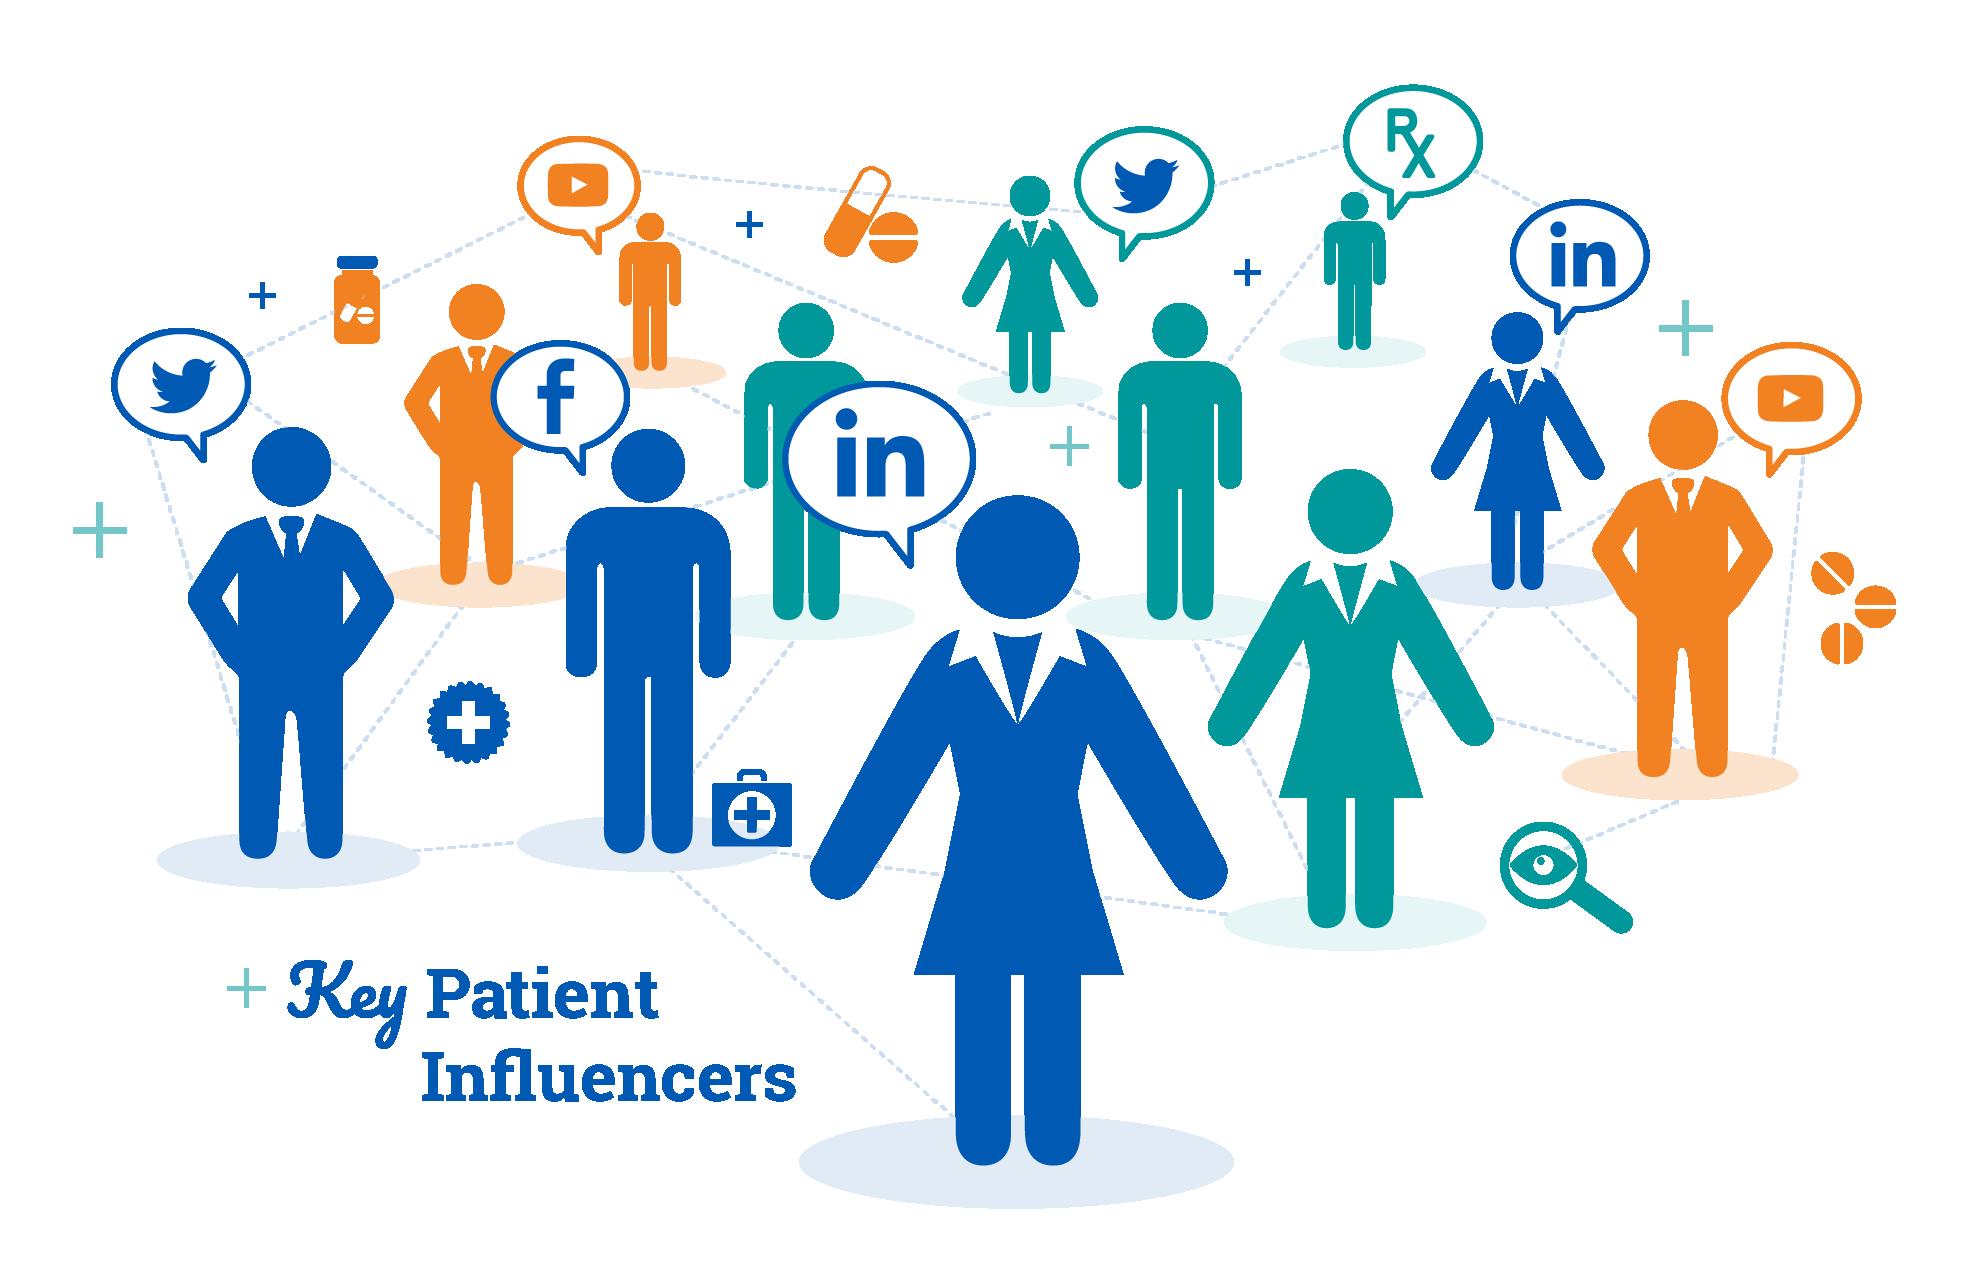 Value-Based Provider Key Influencers Communications